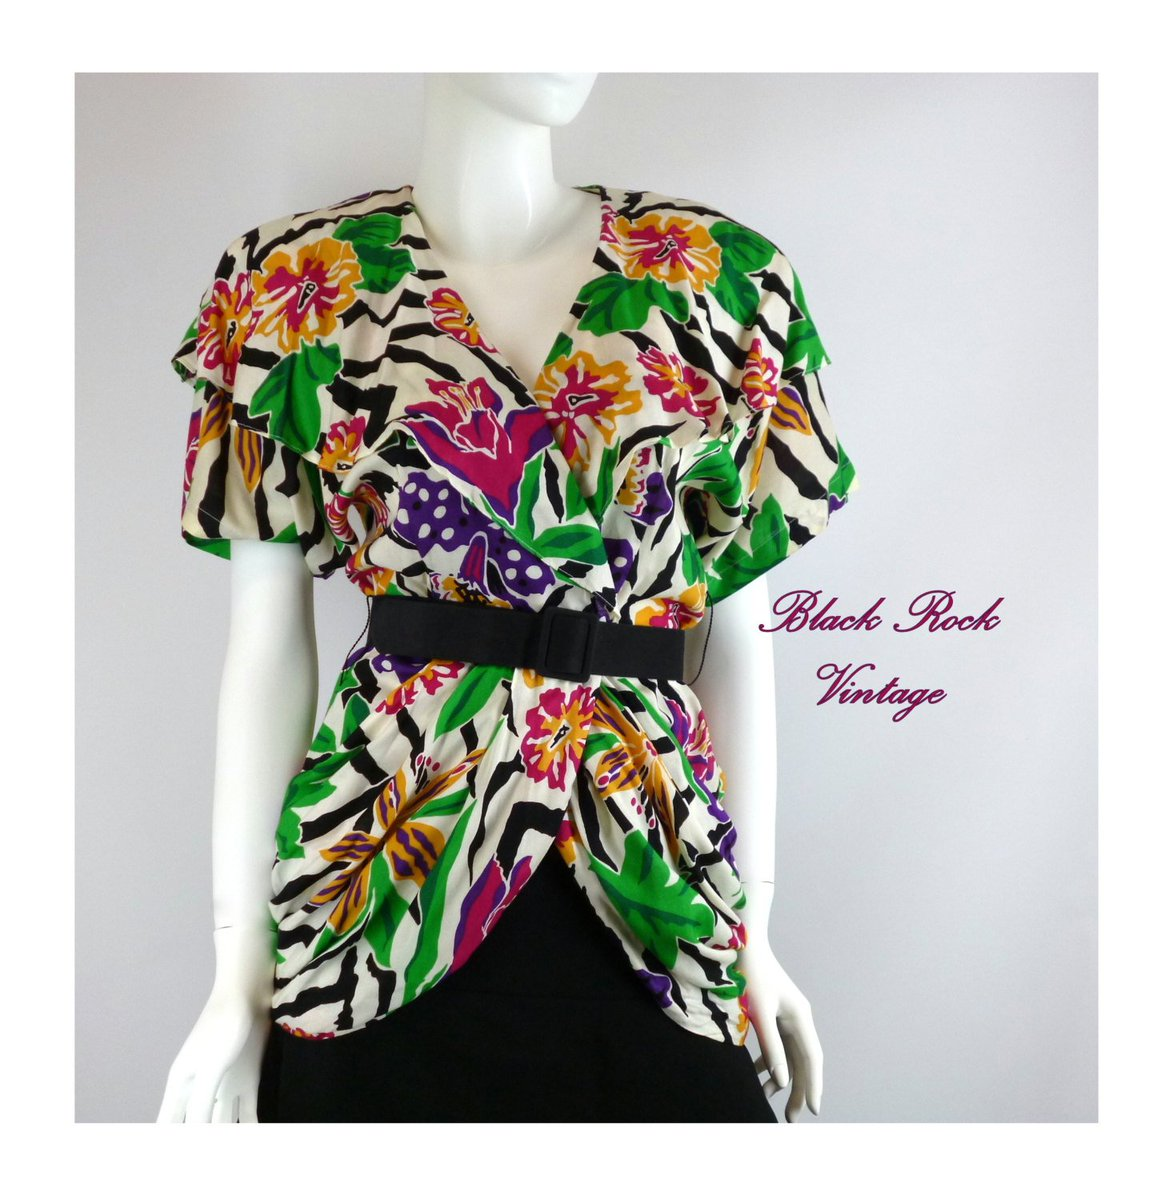 Floral Jacket Tropical Print, Jewel Tones Shawl Collar, Vintage 8… http://etsy.me/2rvVE76 #CouponCode #DrapedBlouse pic.twitter.com/48PrcmALPV